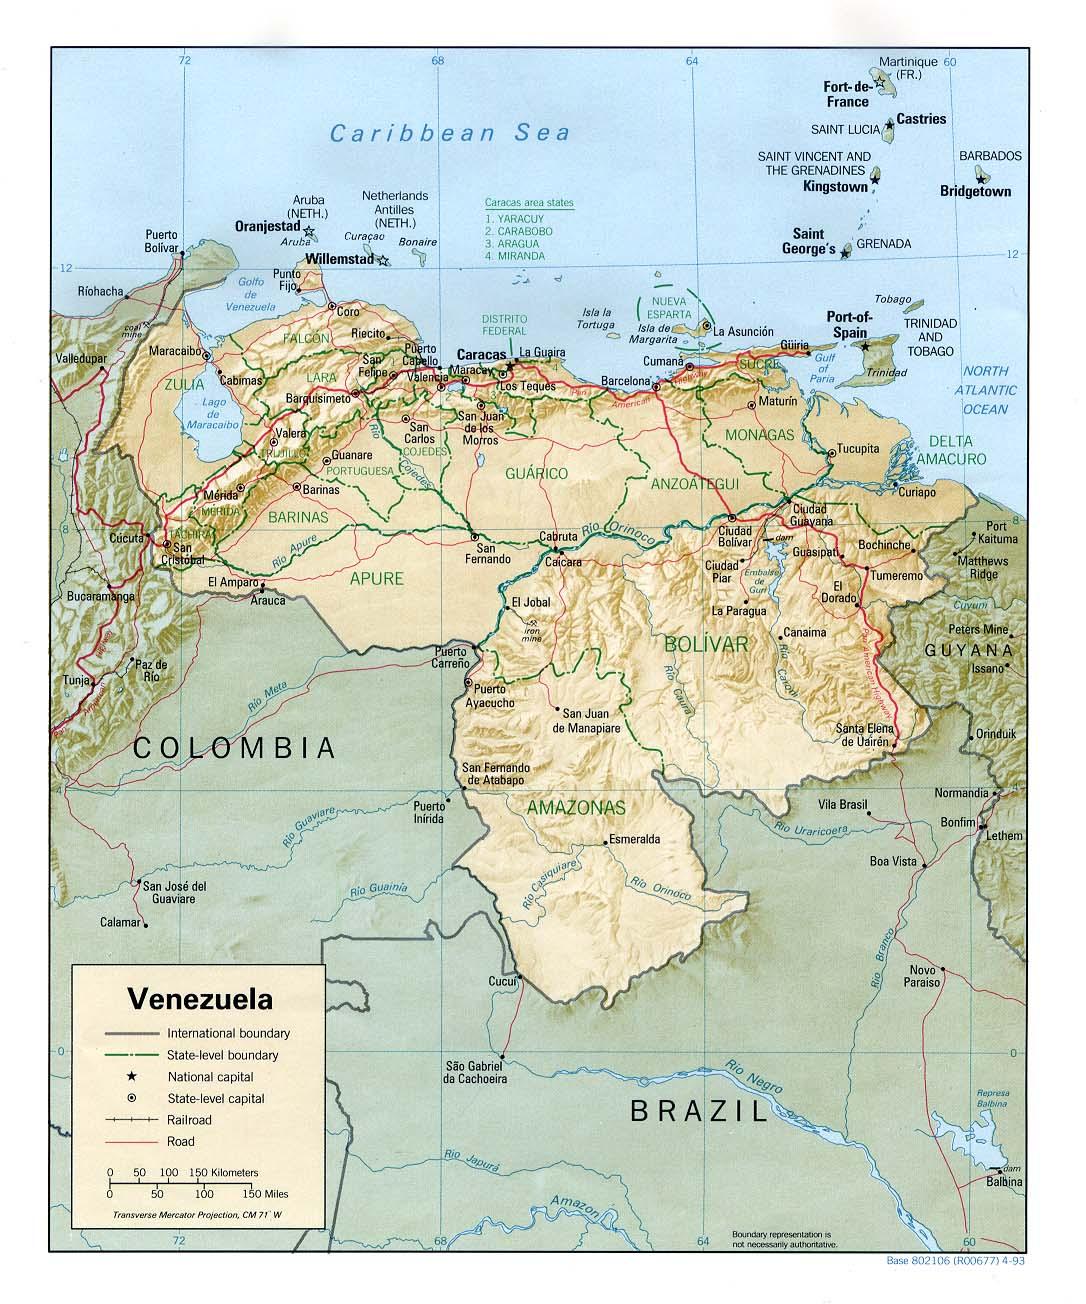 Venezuela Topographic Map.Venezuela Maps Perry Castaneda Map Collection Ut Library Online